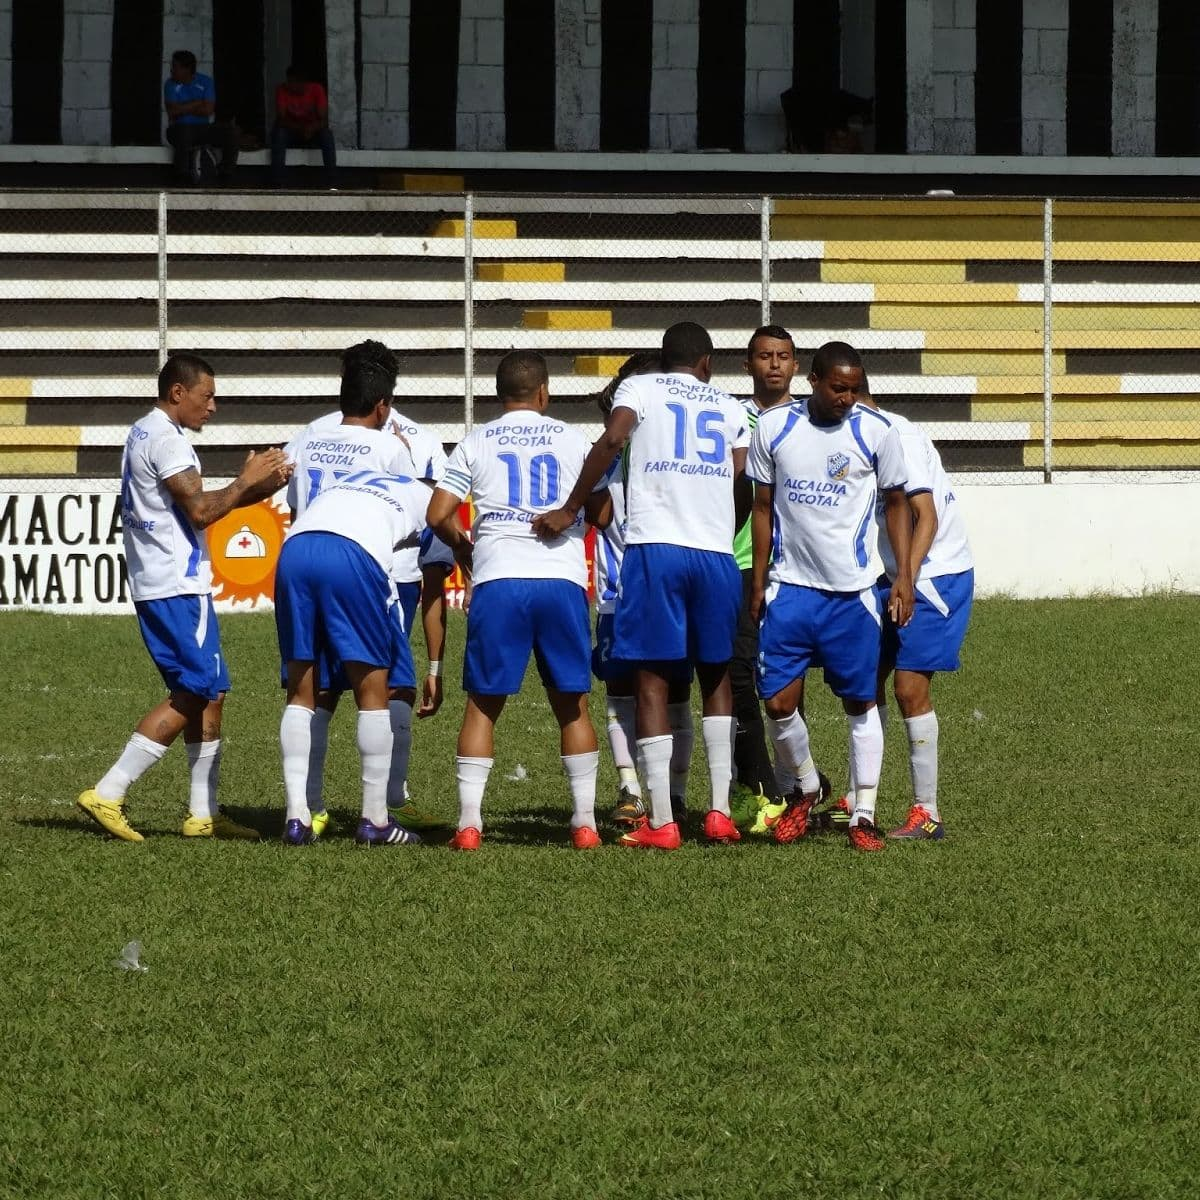 soi-keo-deportivo-ocotal-vs-art-municipal-jalapa-vao-5h-ngay-2-4-2020-1